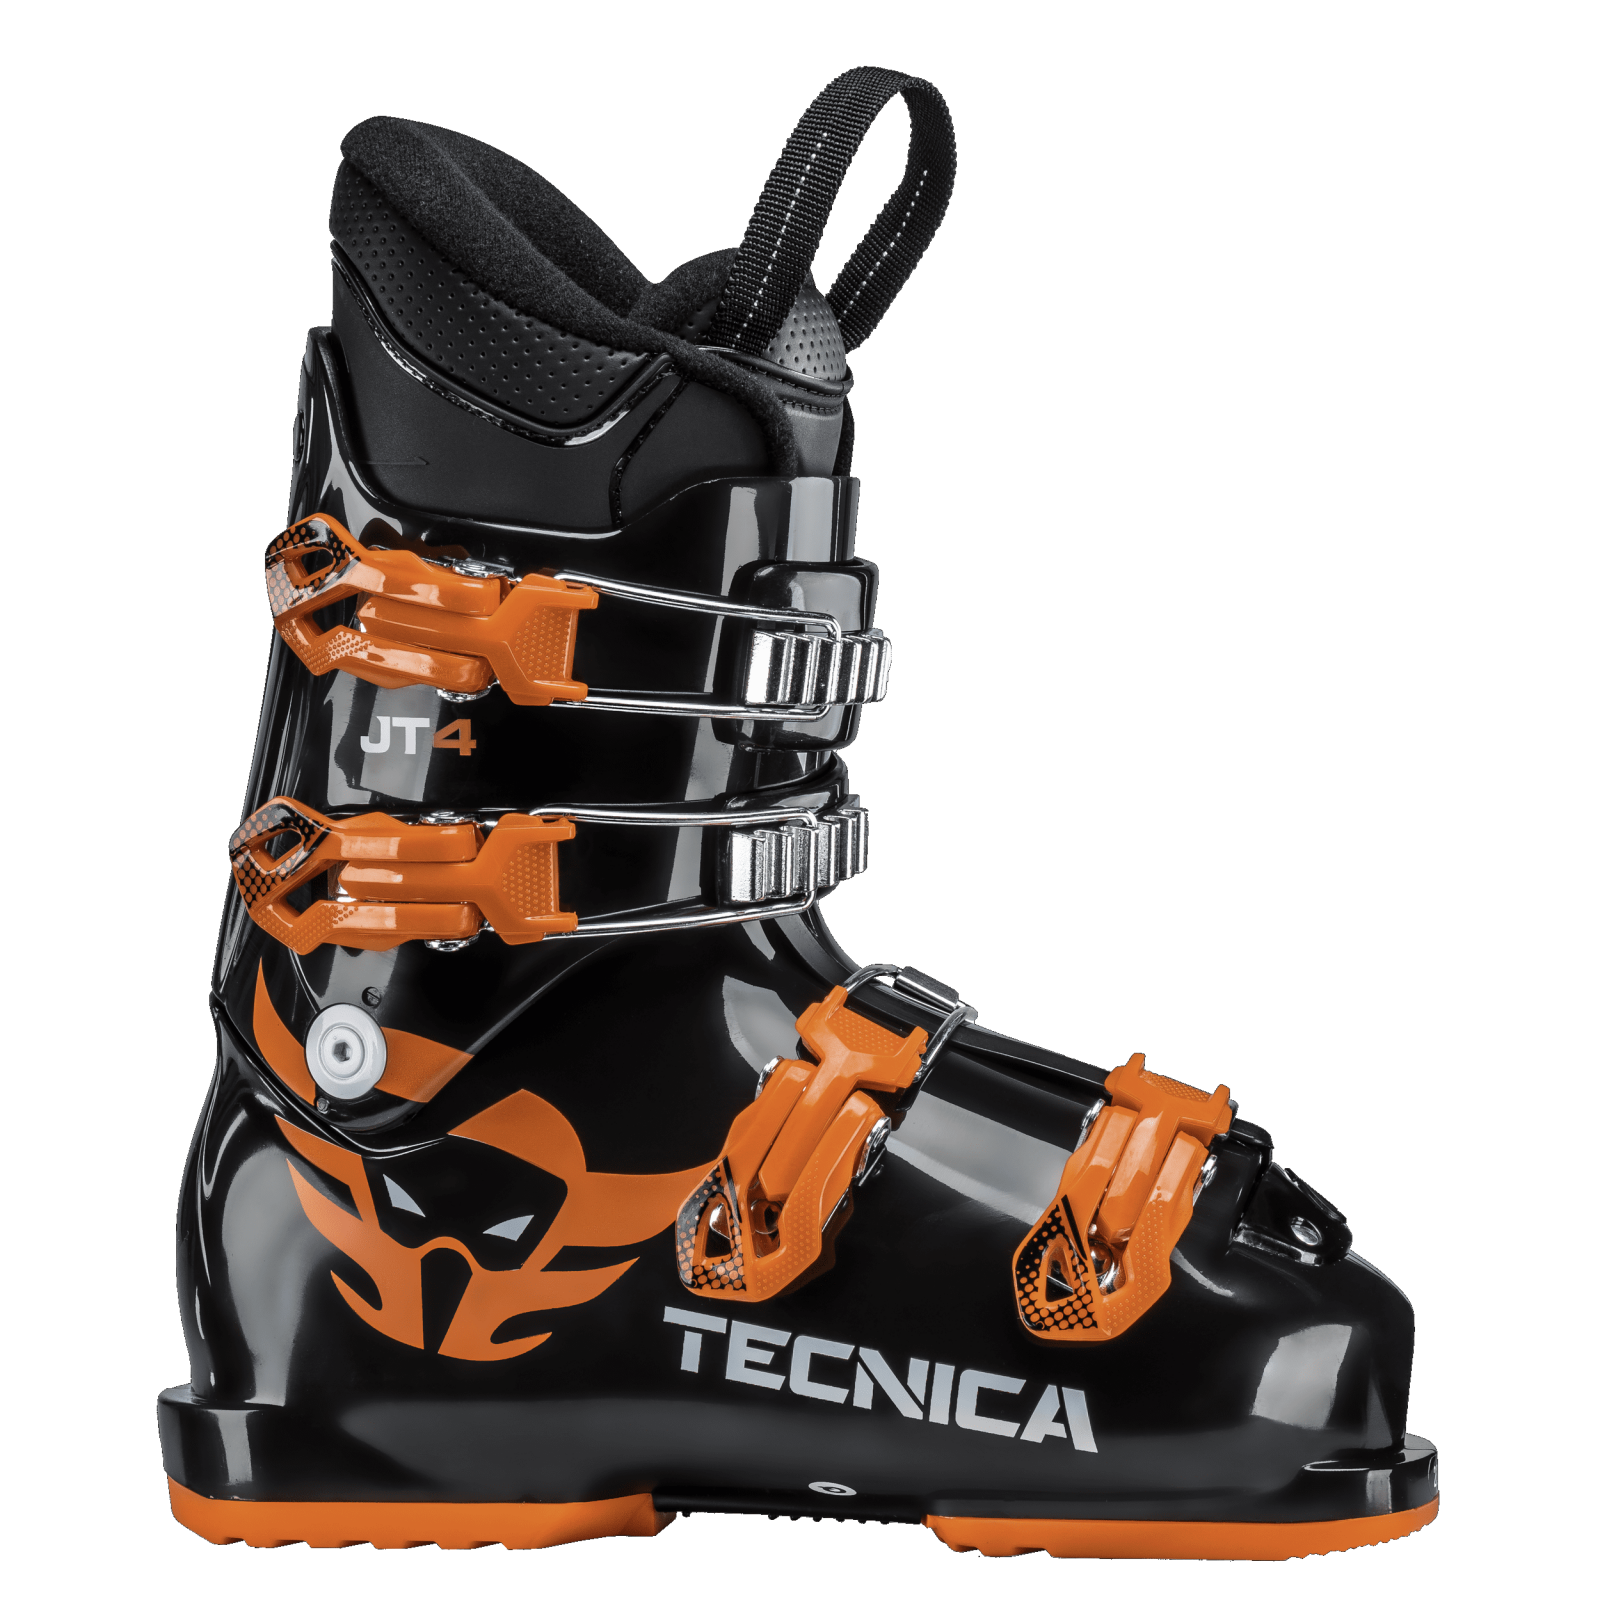 2020 Tecnica JT 4 Junior Ski Boots